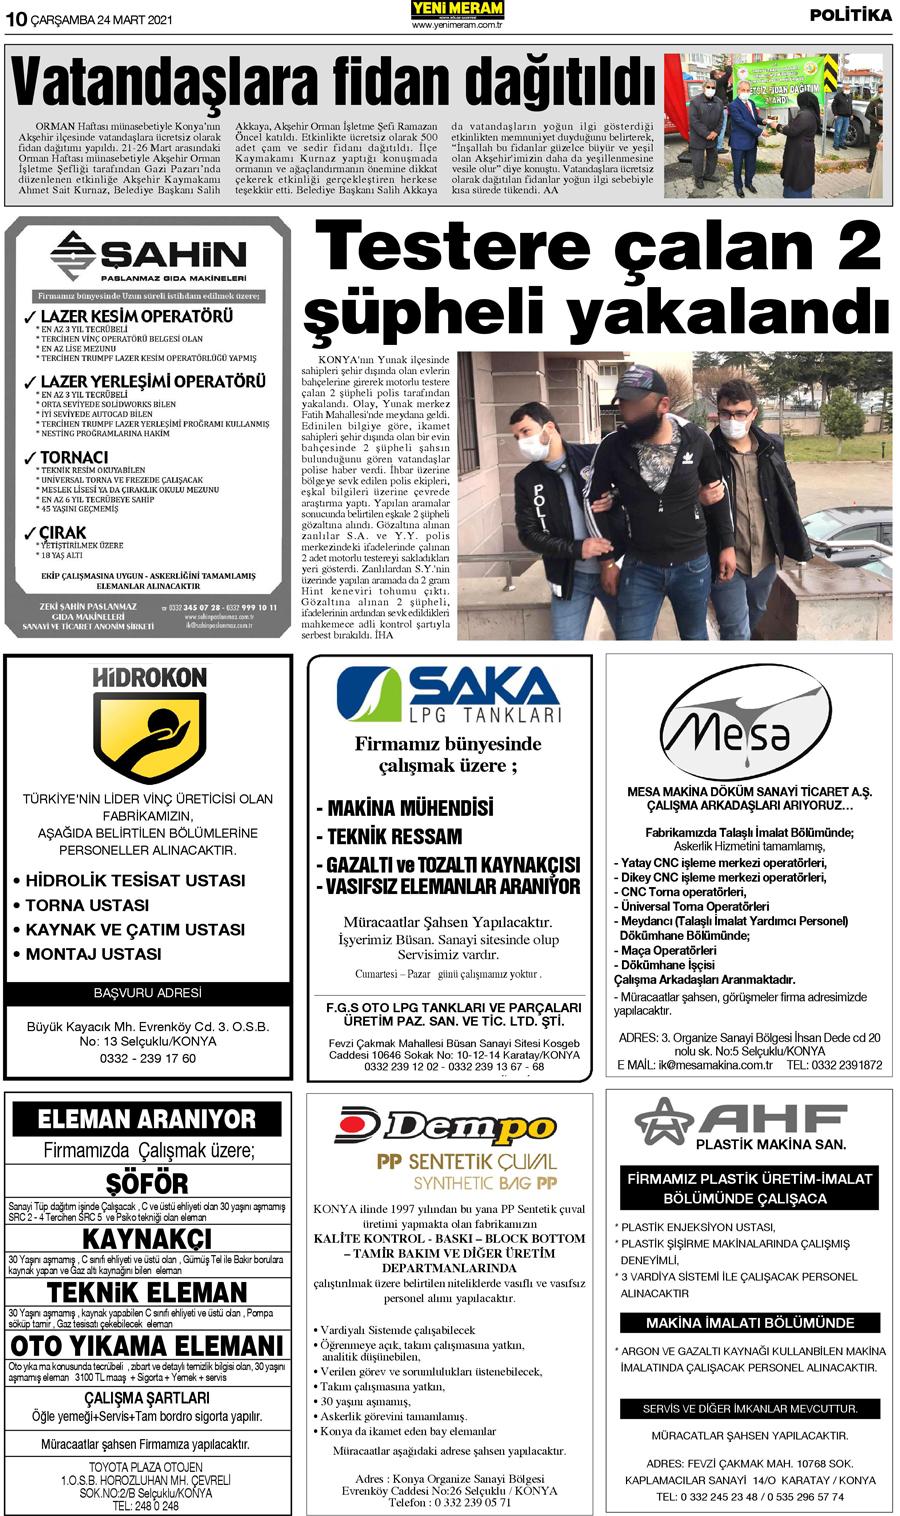 24 Mart 2021 Yeni Meram Gazetesi